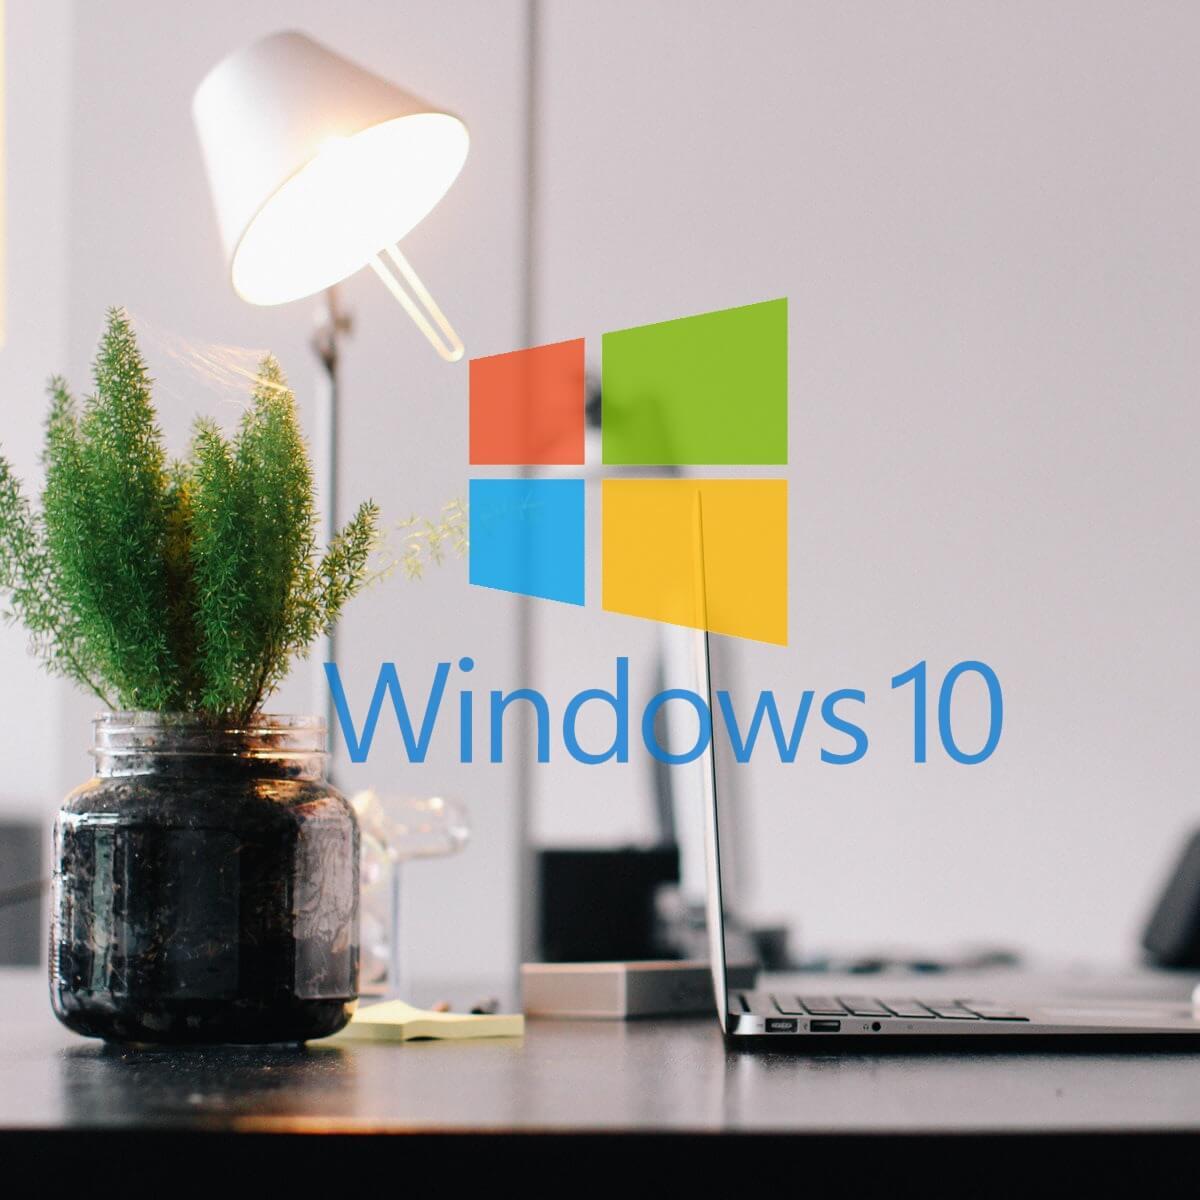 Error-0xe0000100-Windows-10.jpg